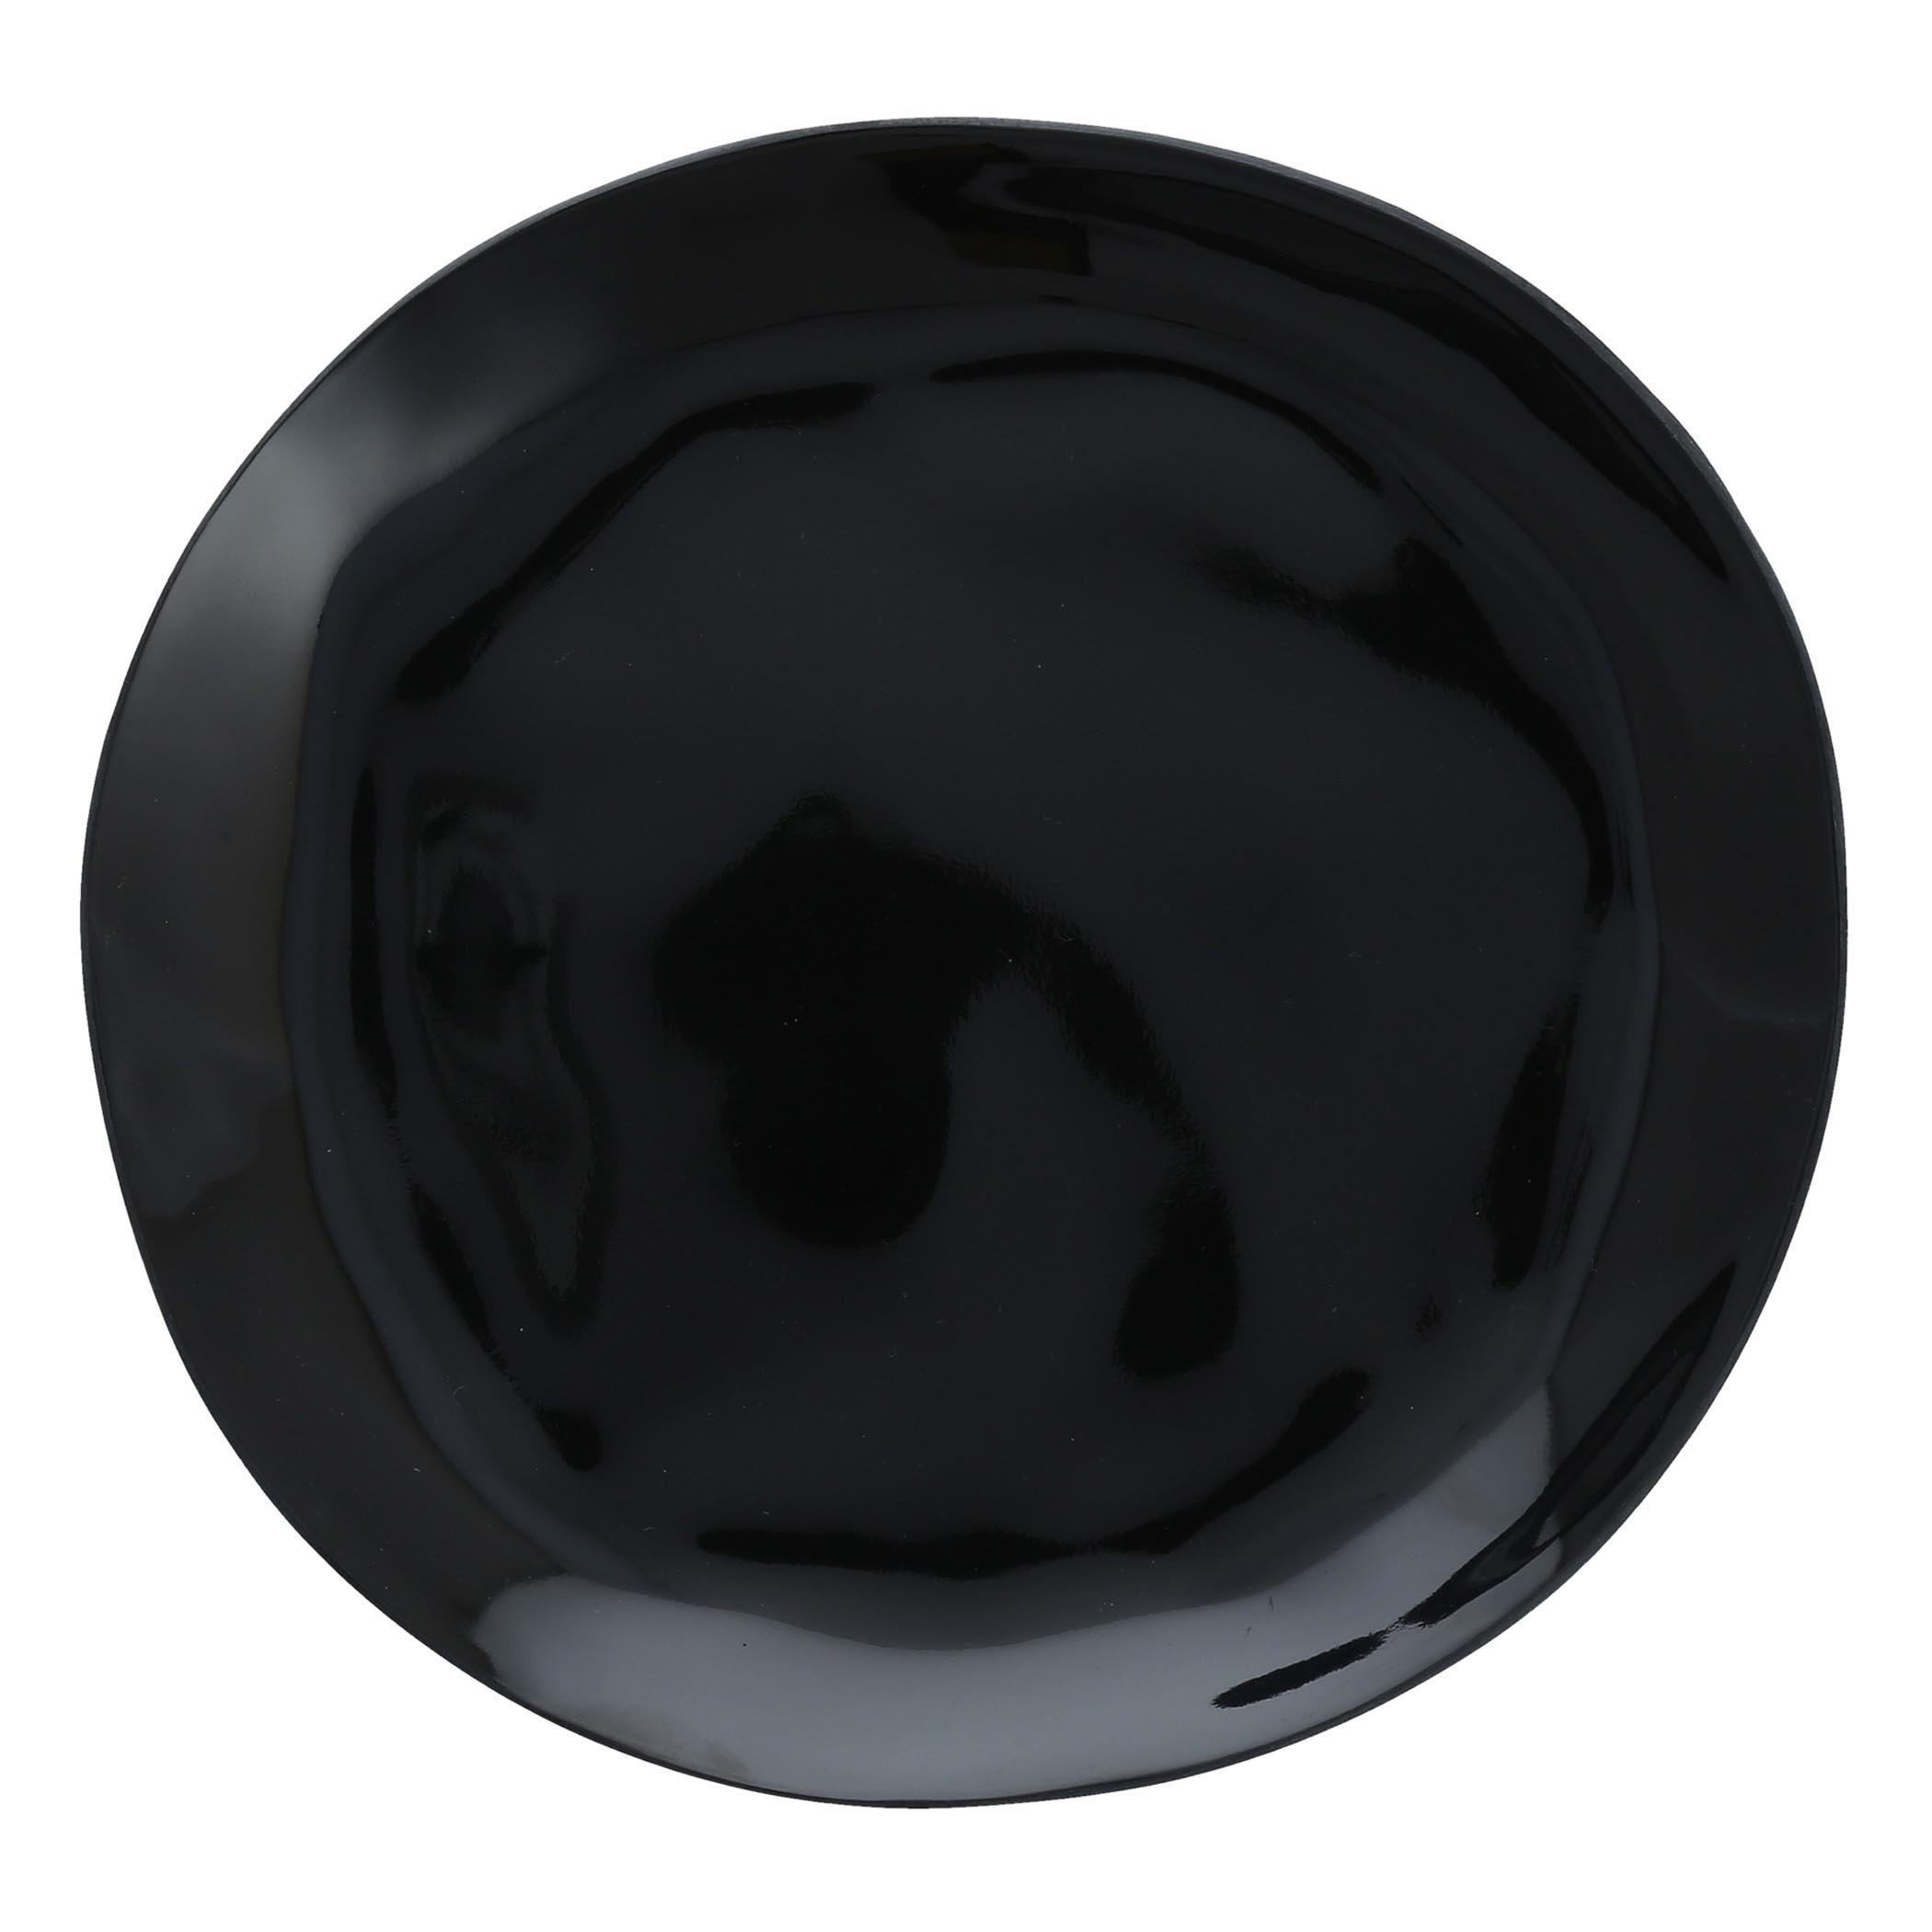 Sandia Dinnerware - Black